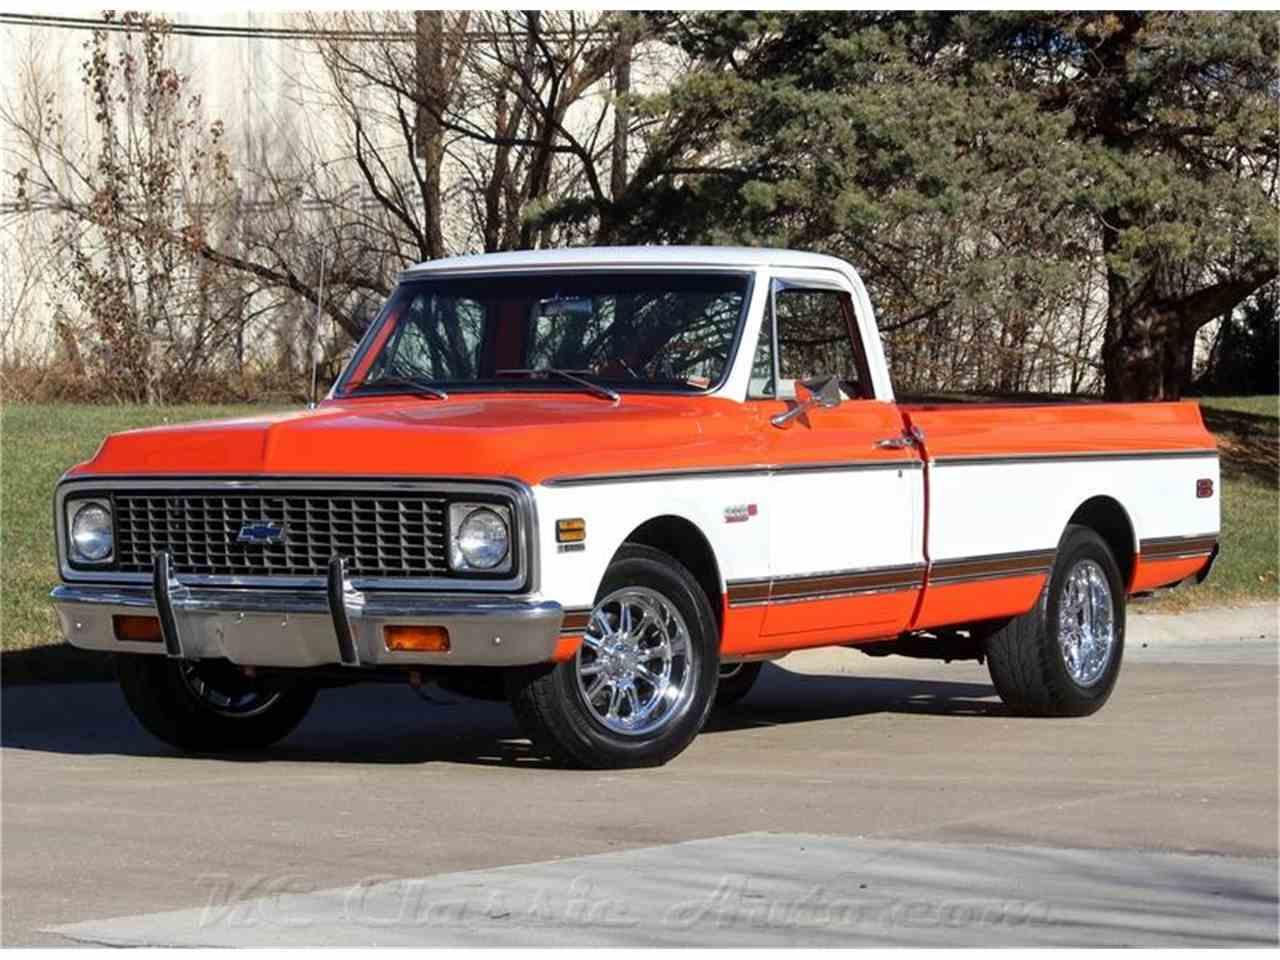 All Chevy chevy cheyenne c10 : 1971 Chevrolet C10 Cheyenne Super Restored with 502V8 for Sale ...